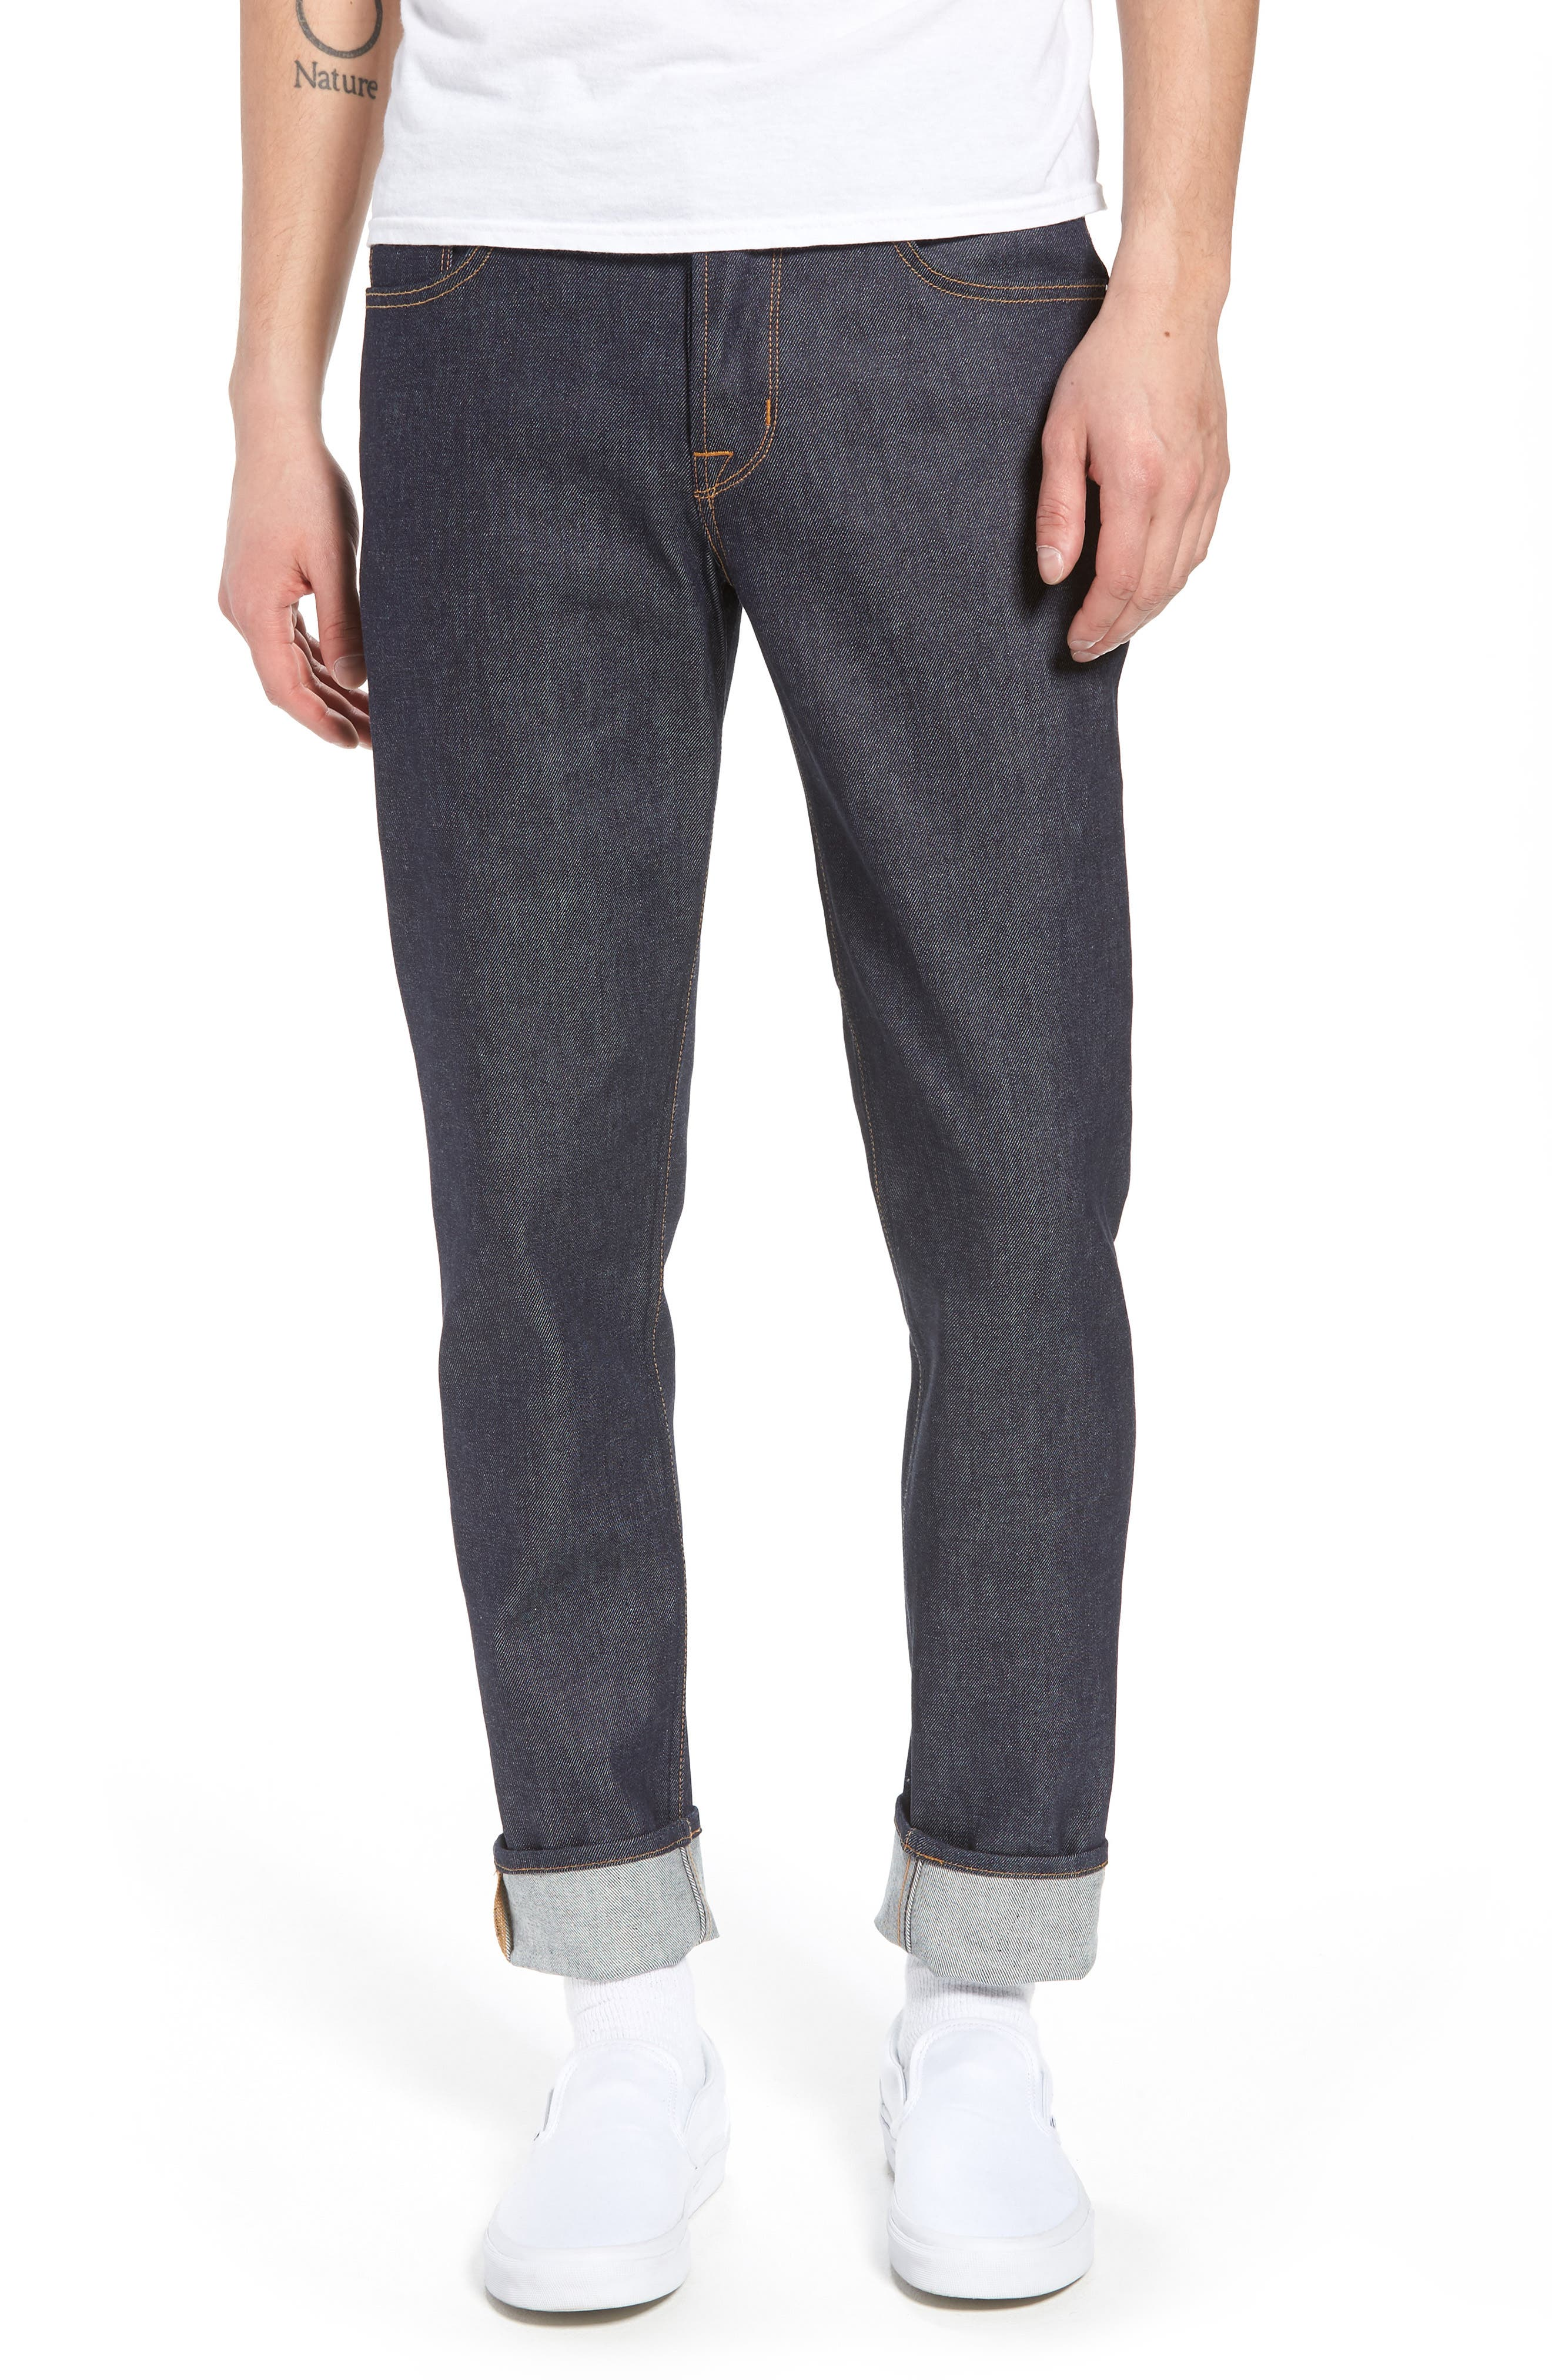 Sartor Skinny Fit Jeans,                         Main,                         color, Raw